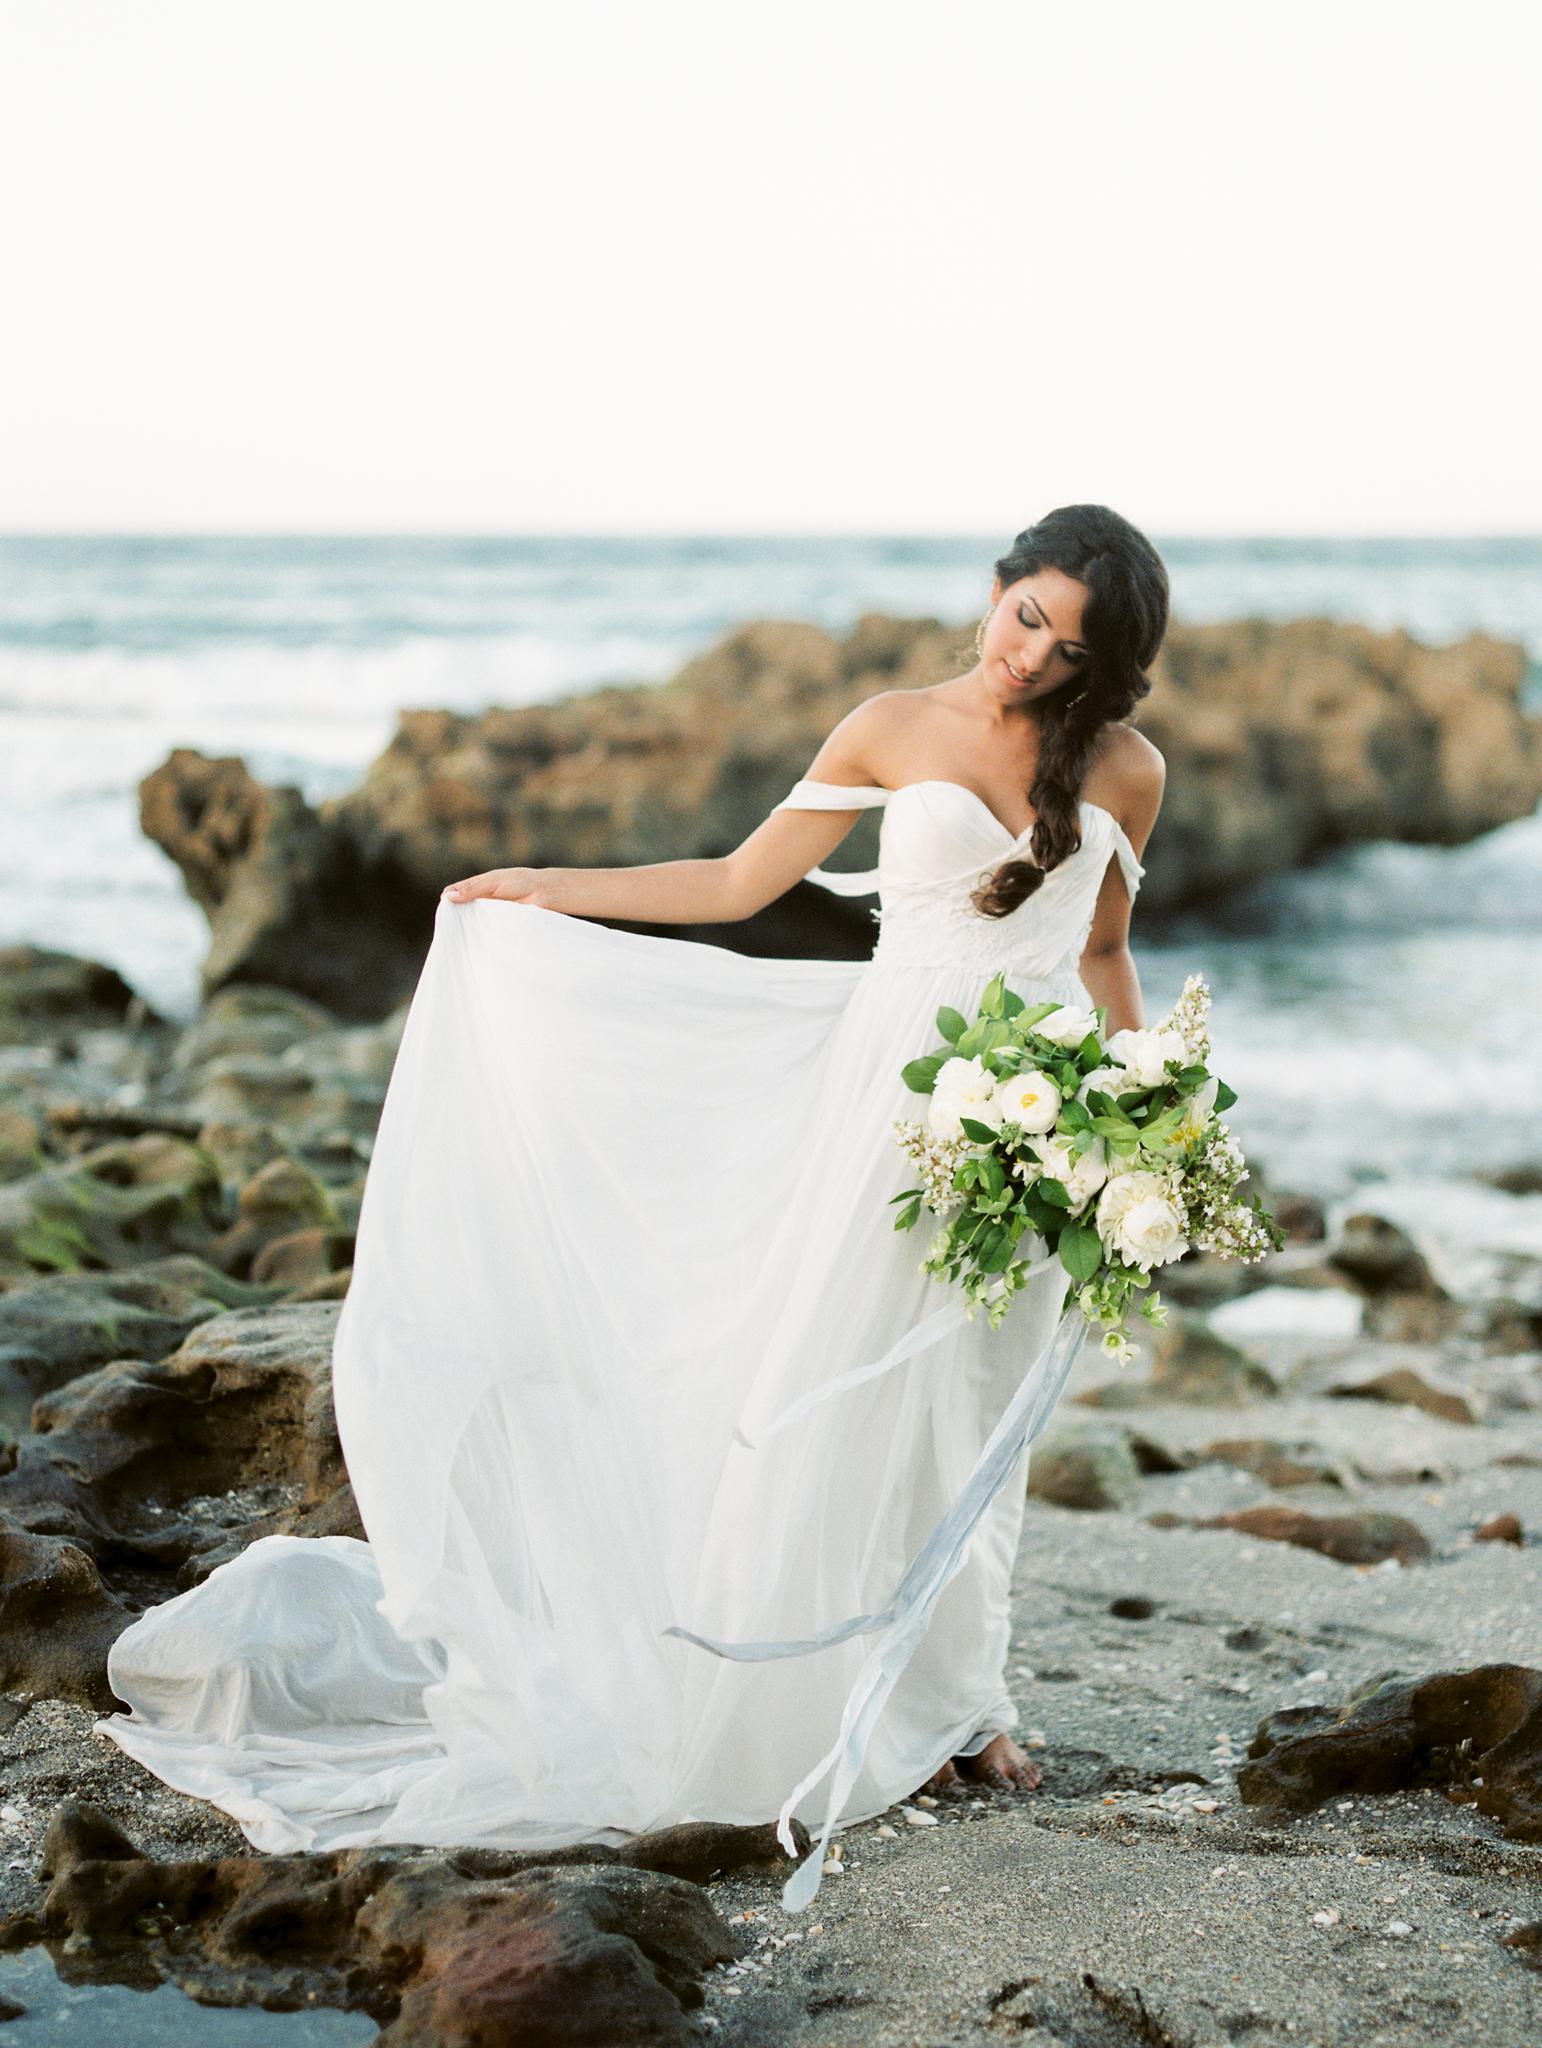 coral cove, jupiter beach FL, palm beach wedding photos, wedding gown dress on bride